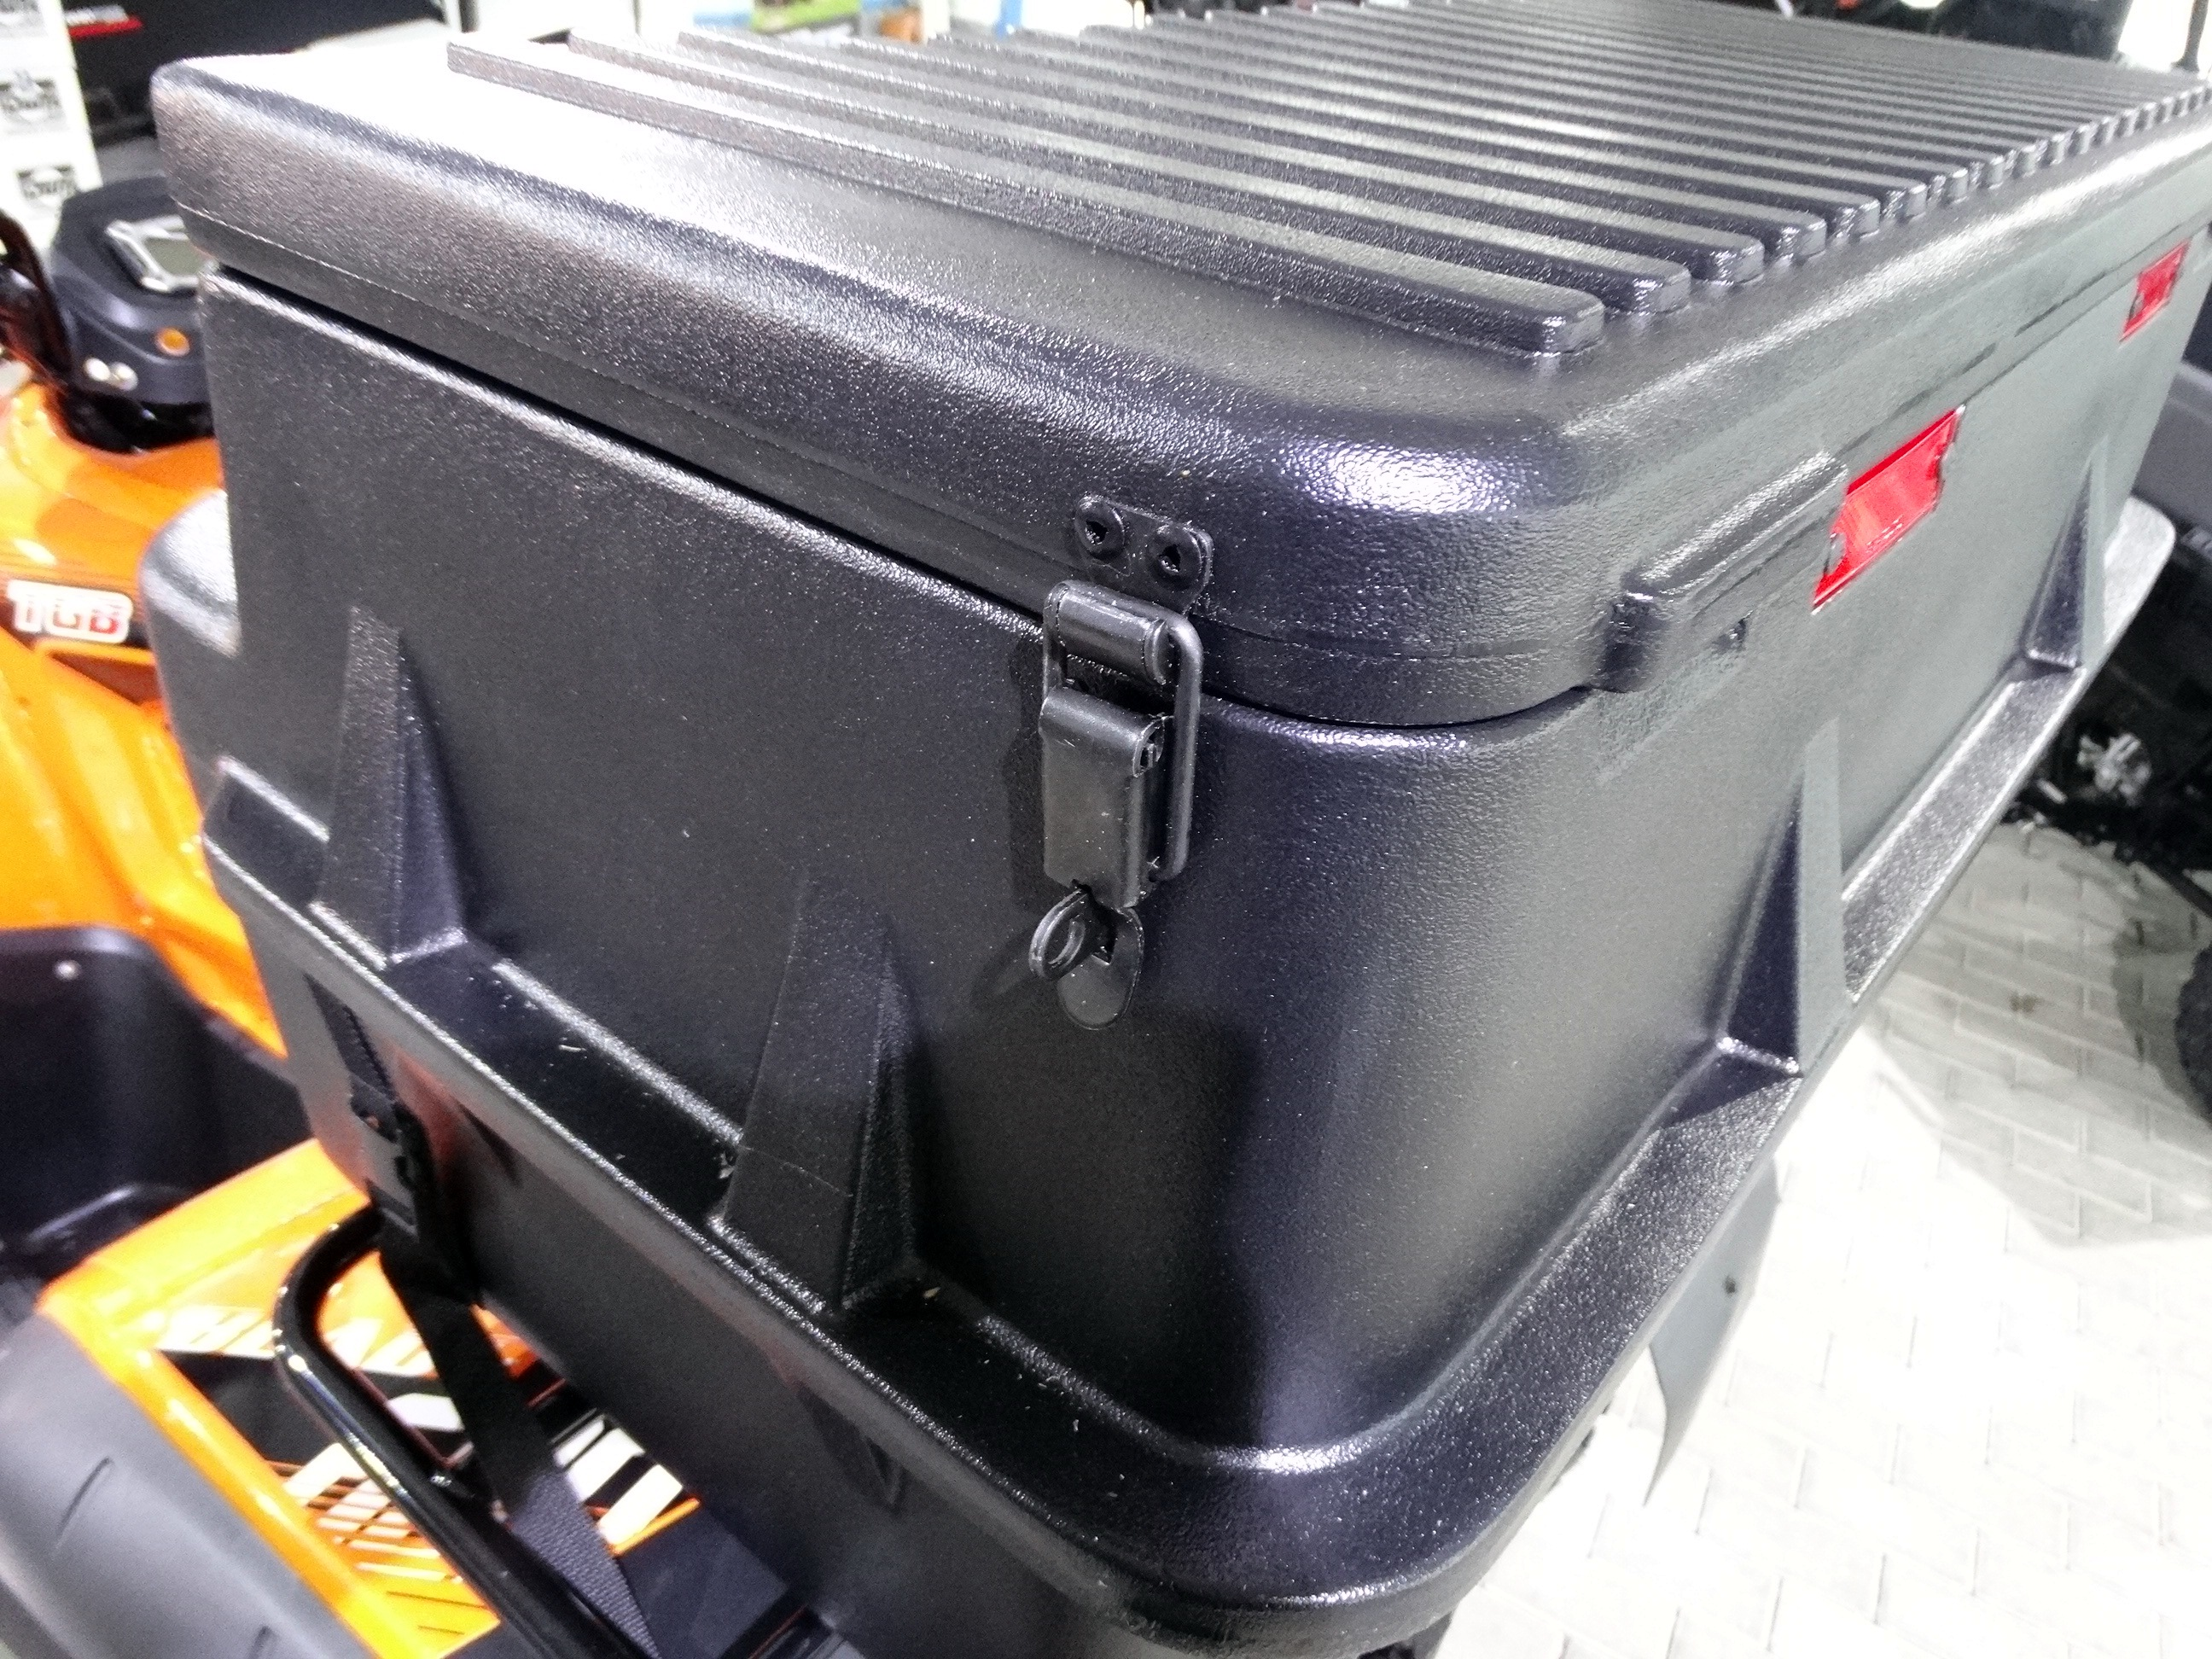 moose utility explorer box quad coffre arri re topcase kymco mxu 450 500 550 700 ebay. Black Bedroom Furniture Sets. Home Design Ideas